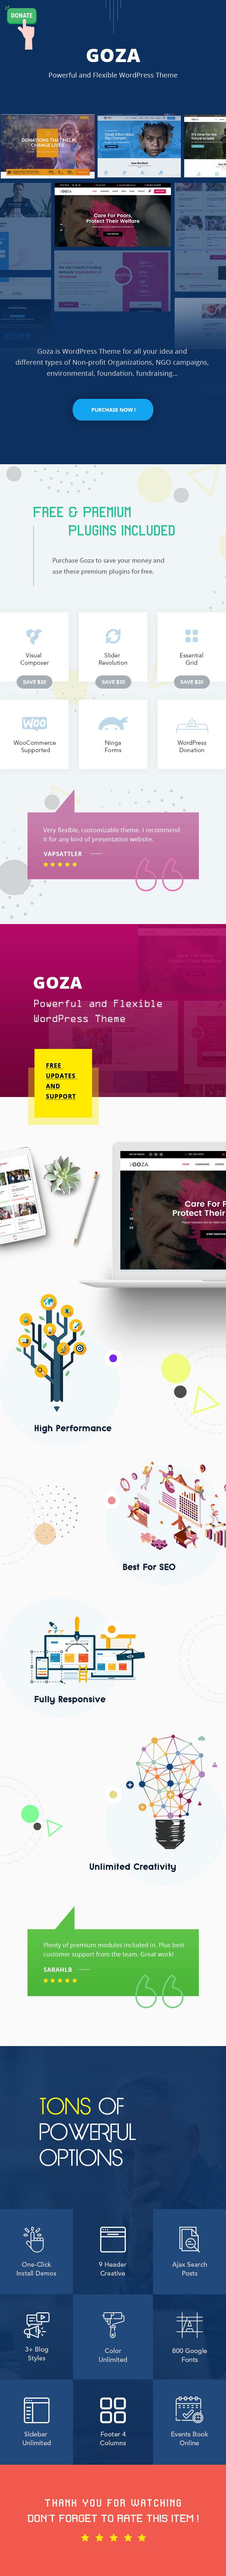 Goza - Nonprofit Charity WordPress Theme - 1